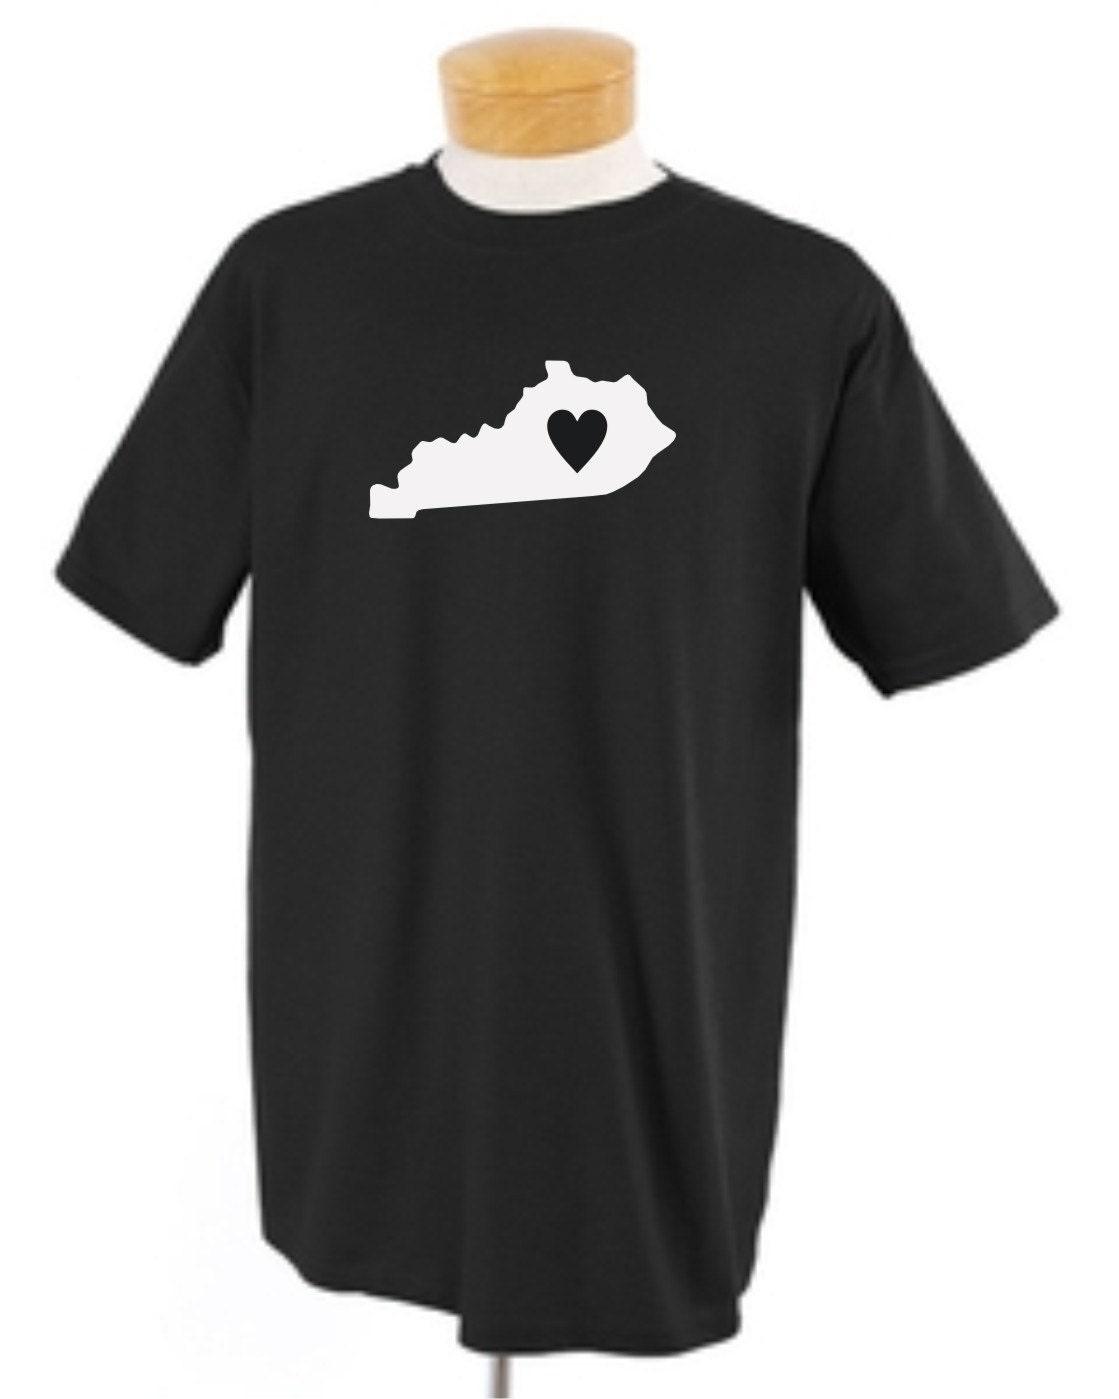 Adult shirt kentucky state custom tshirt new for Custom t shirts lexington ky